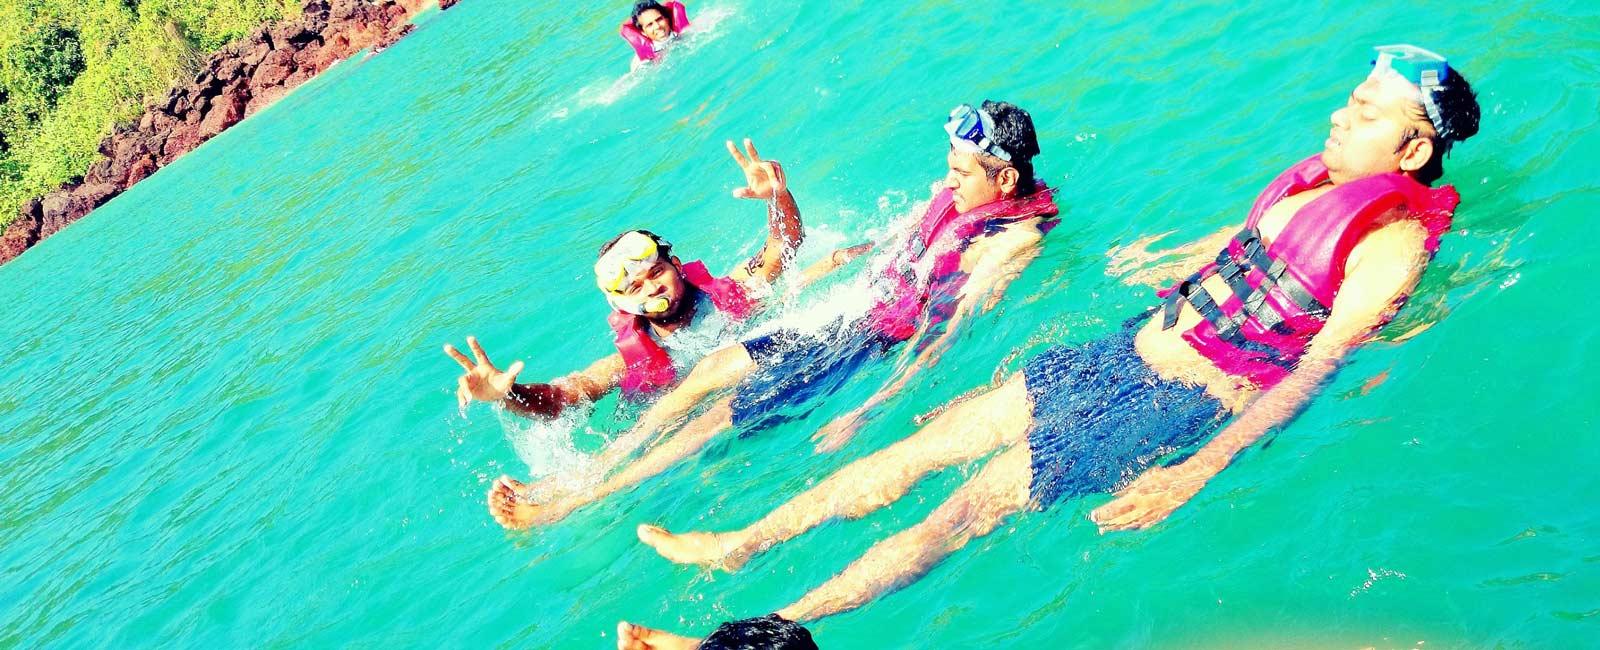 Grand-island-snorkeling-trip-goa